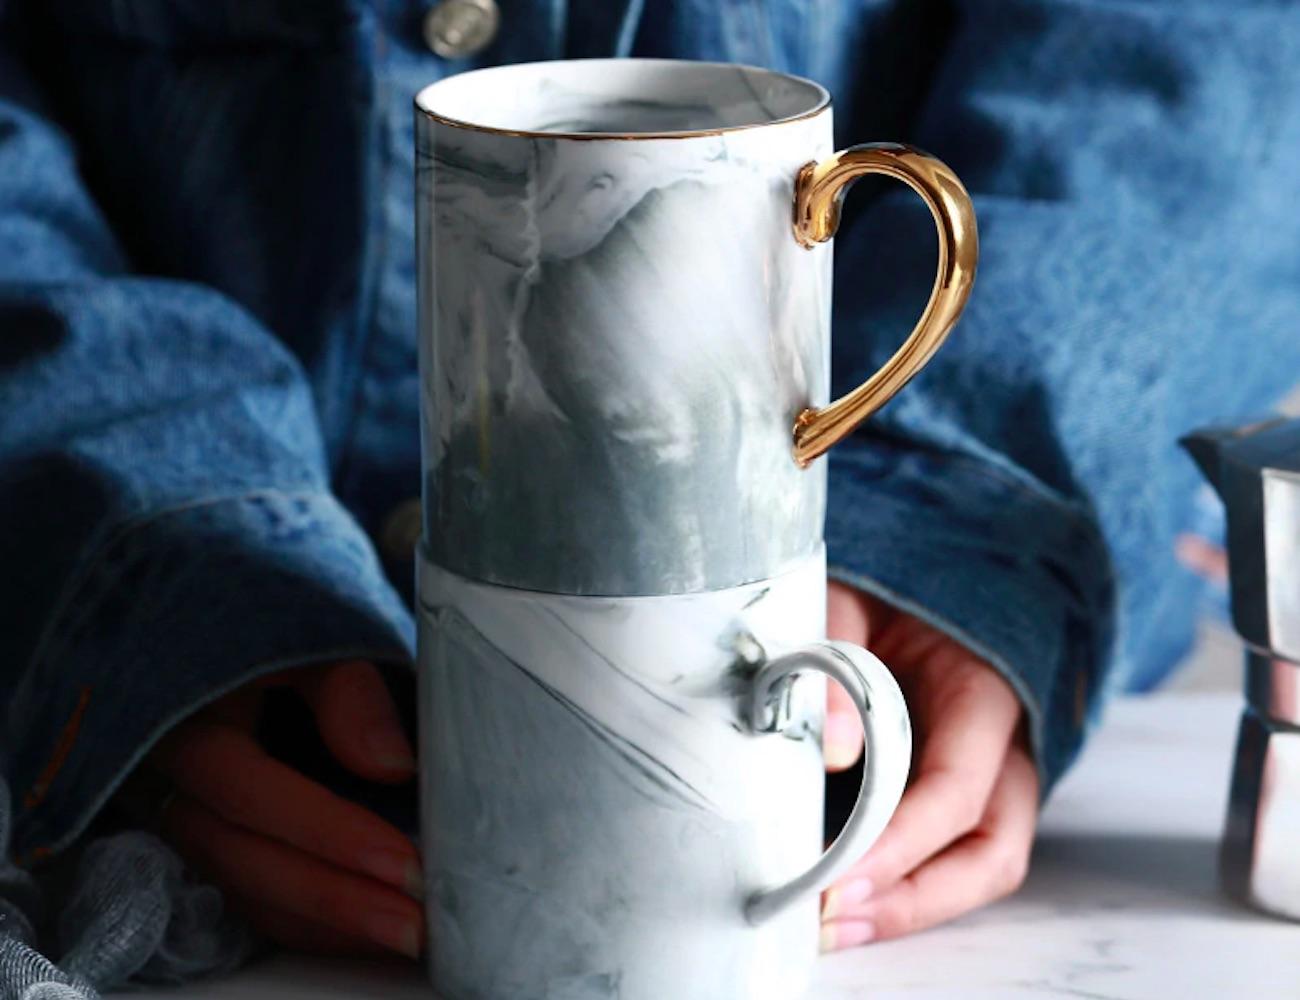 Lekoch Gold-Rimmed Marble Coffee Mug is fabulously stylish